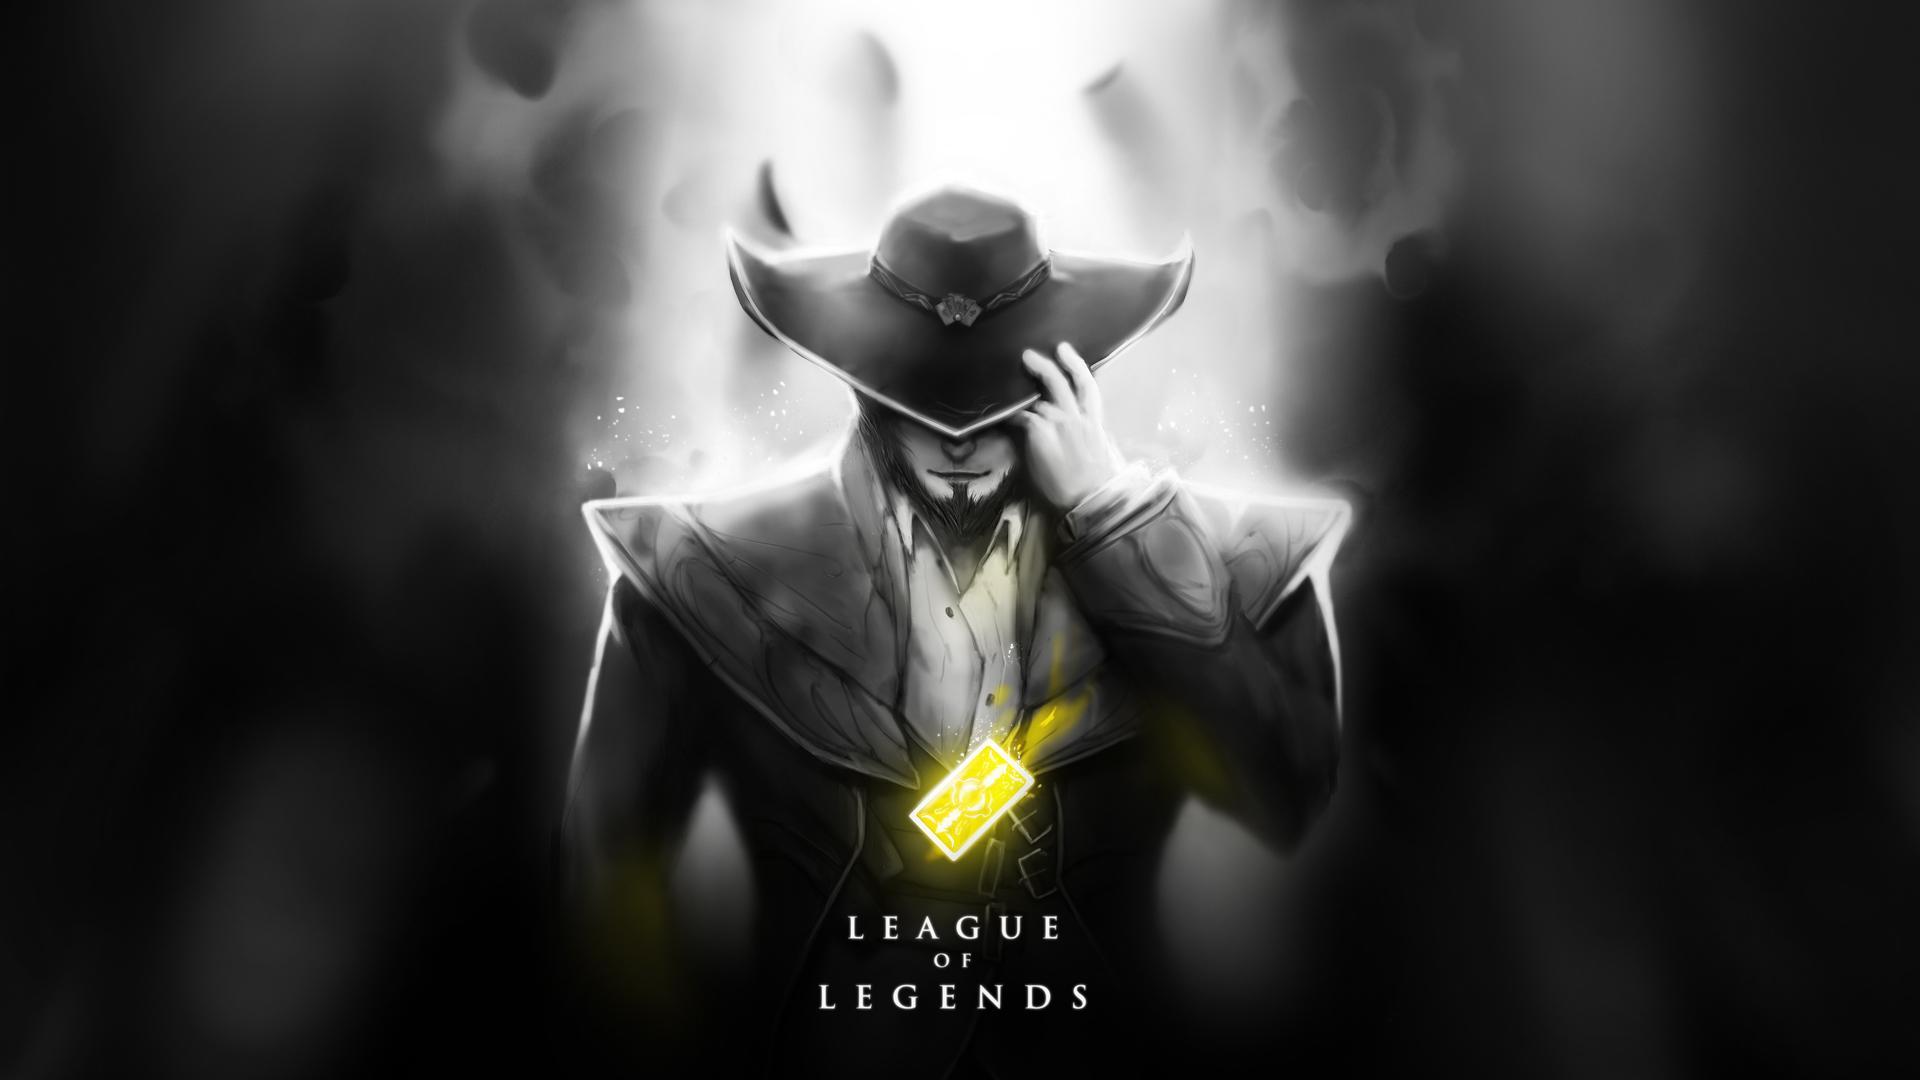 League of Legends wallpaper 106